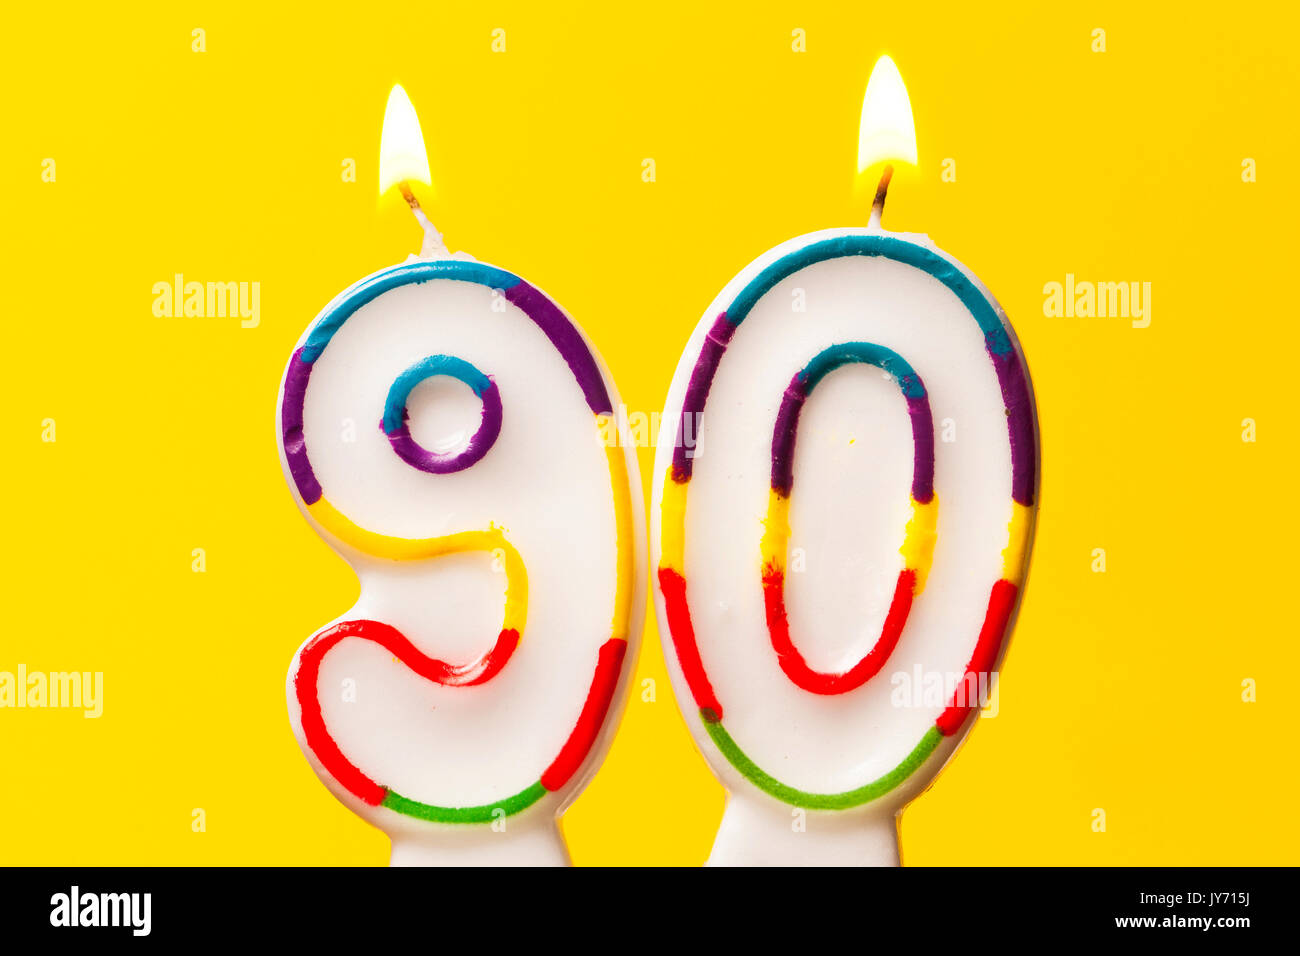 Happy 90th Birthday Stock Photos Amp Happy 90th Birthday